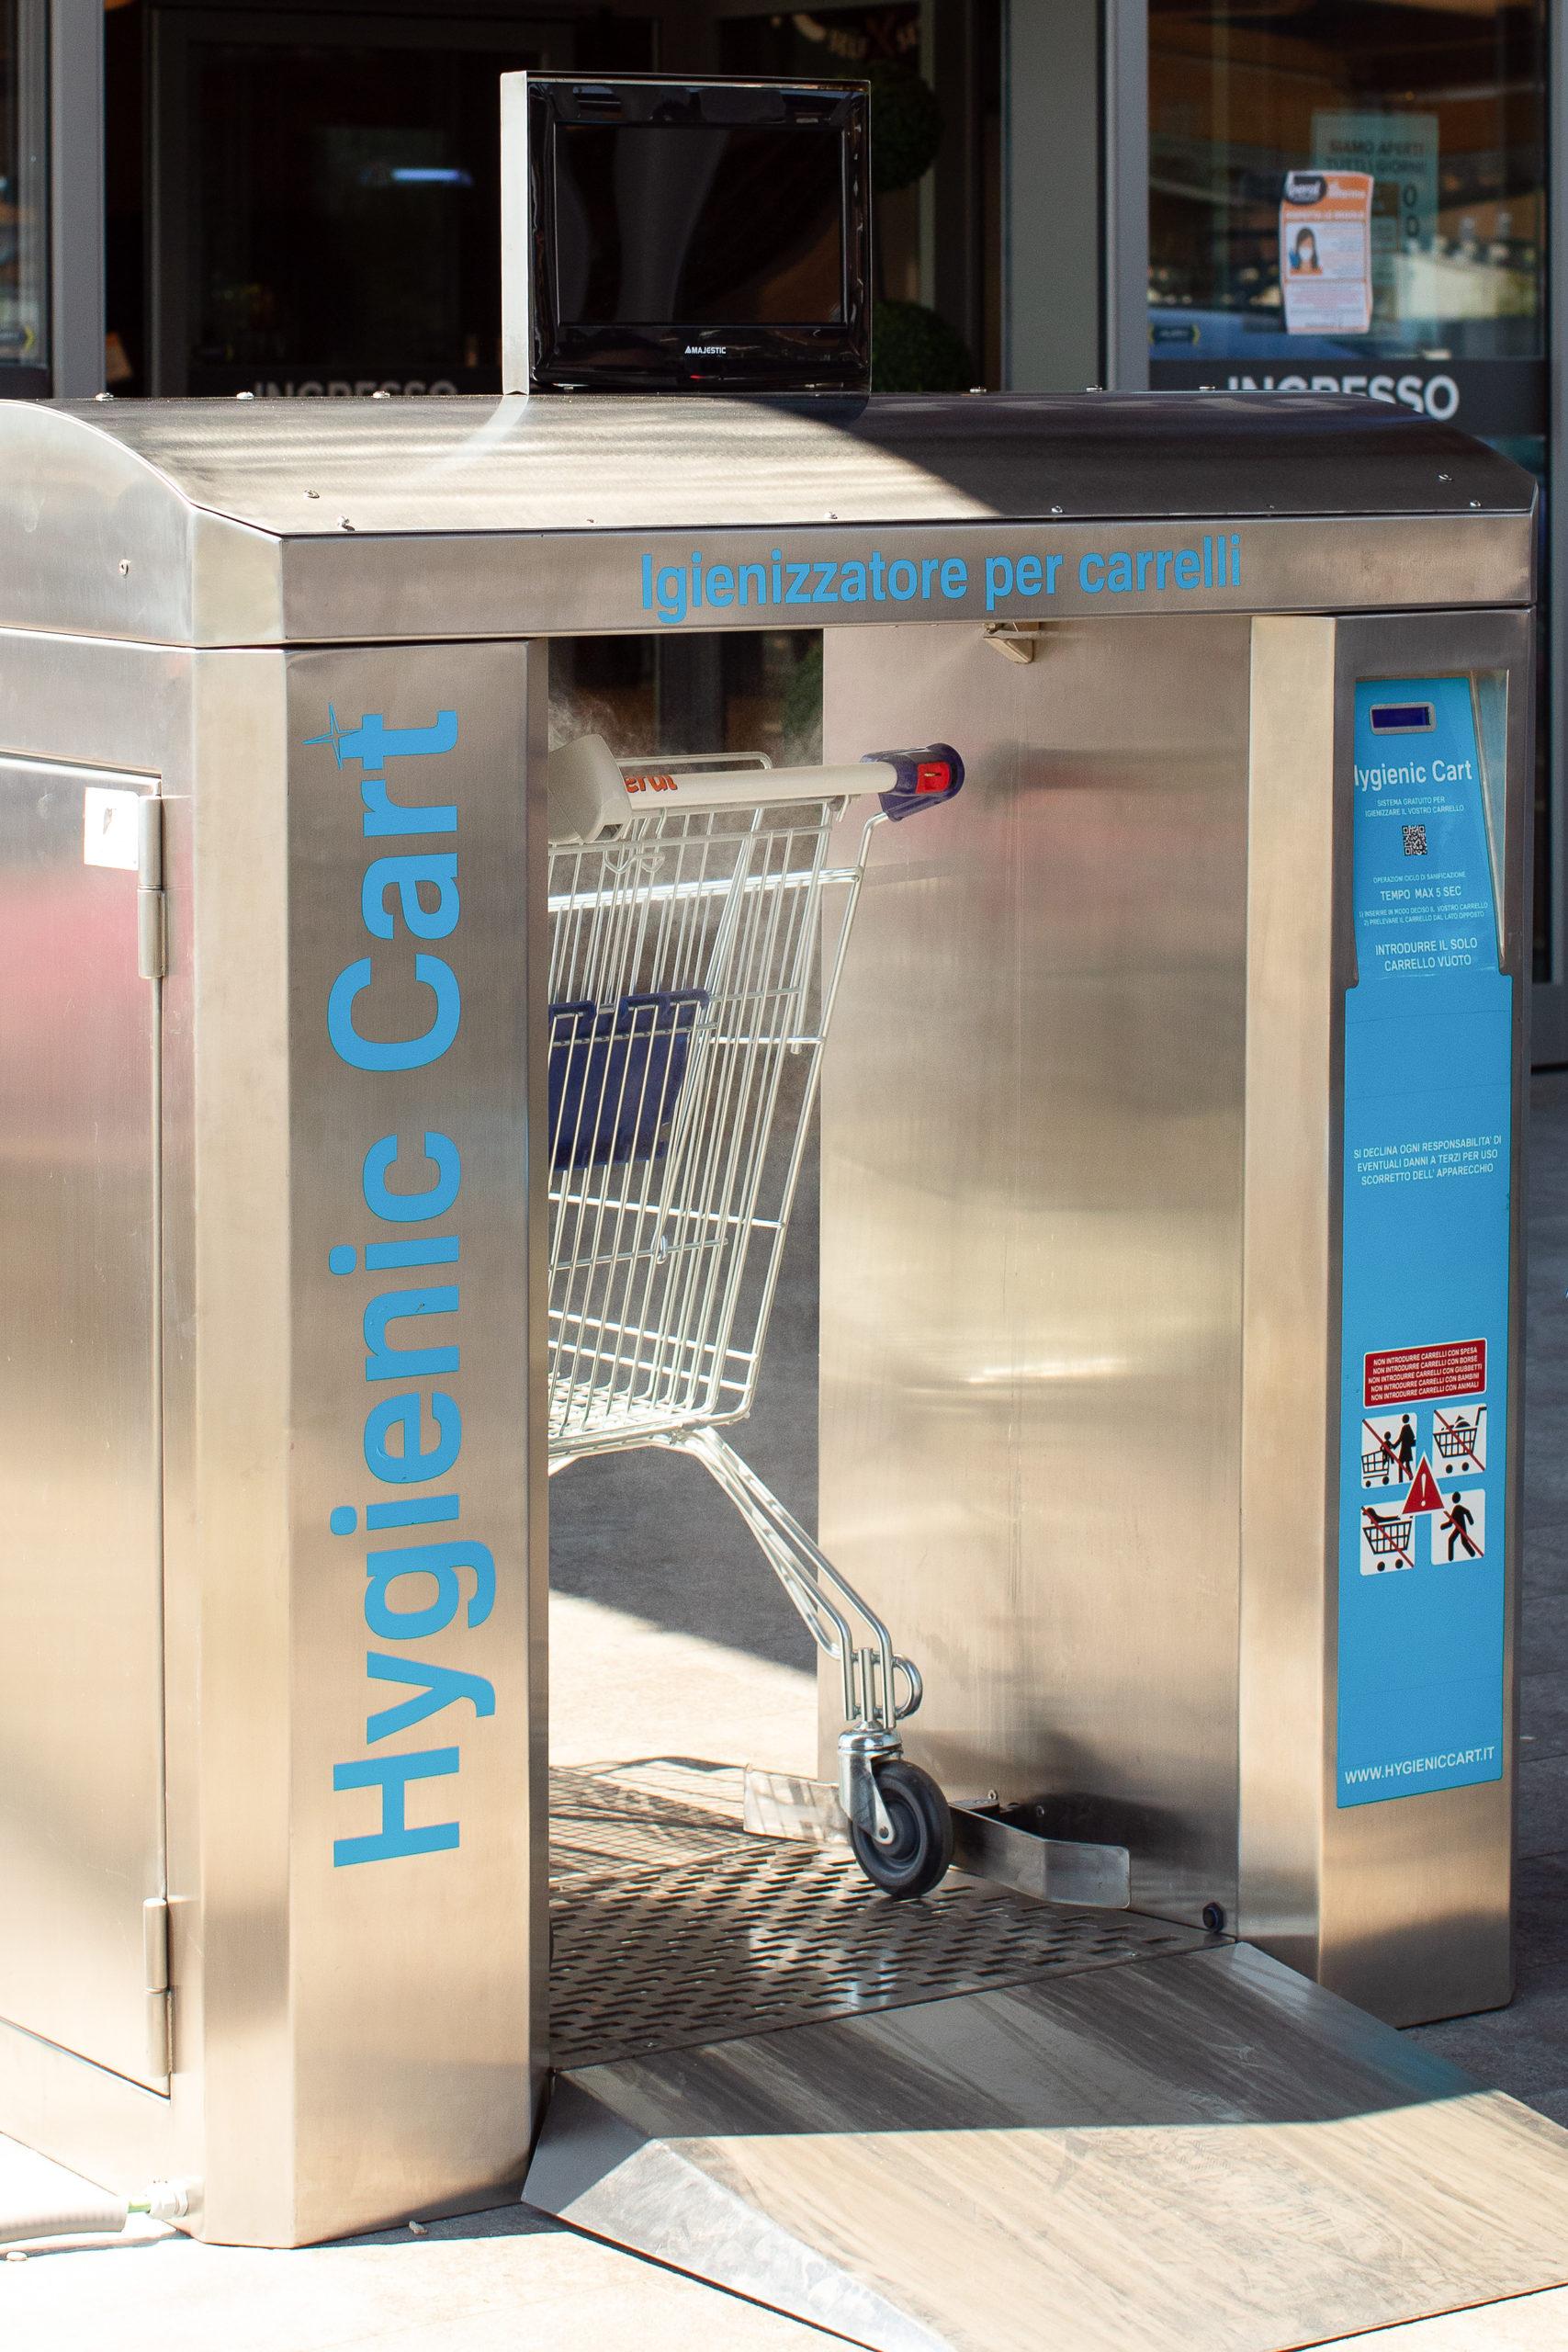 Hygienic Cart